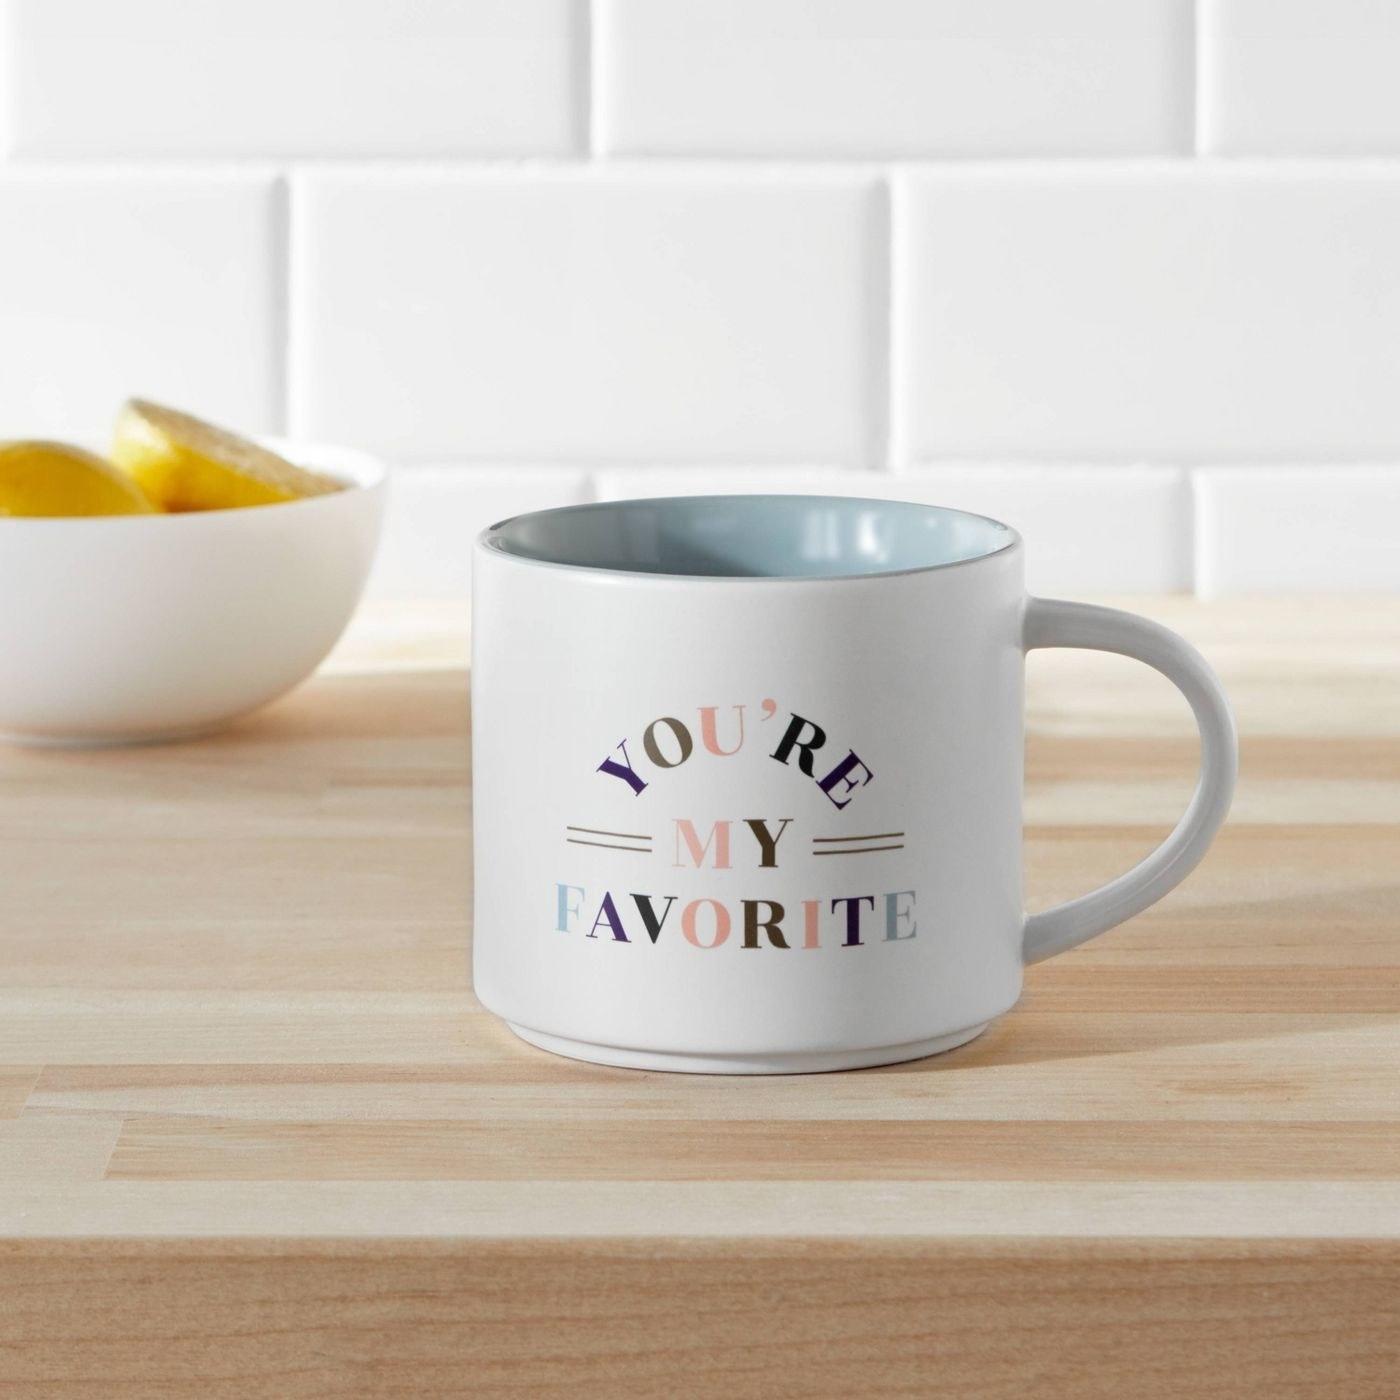 White and rainbow mug with pale blue inside